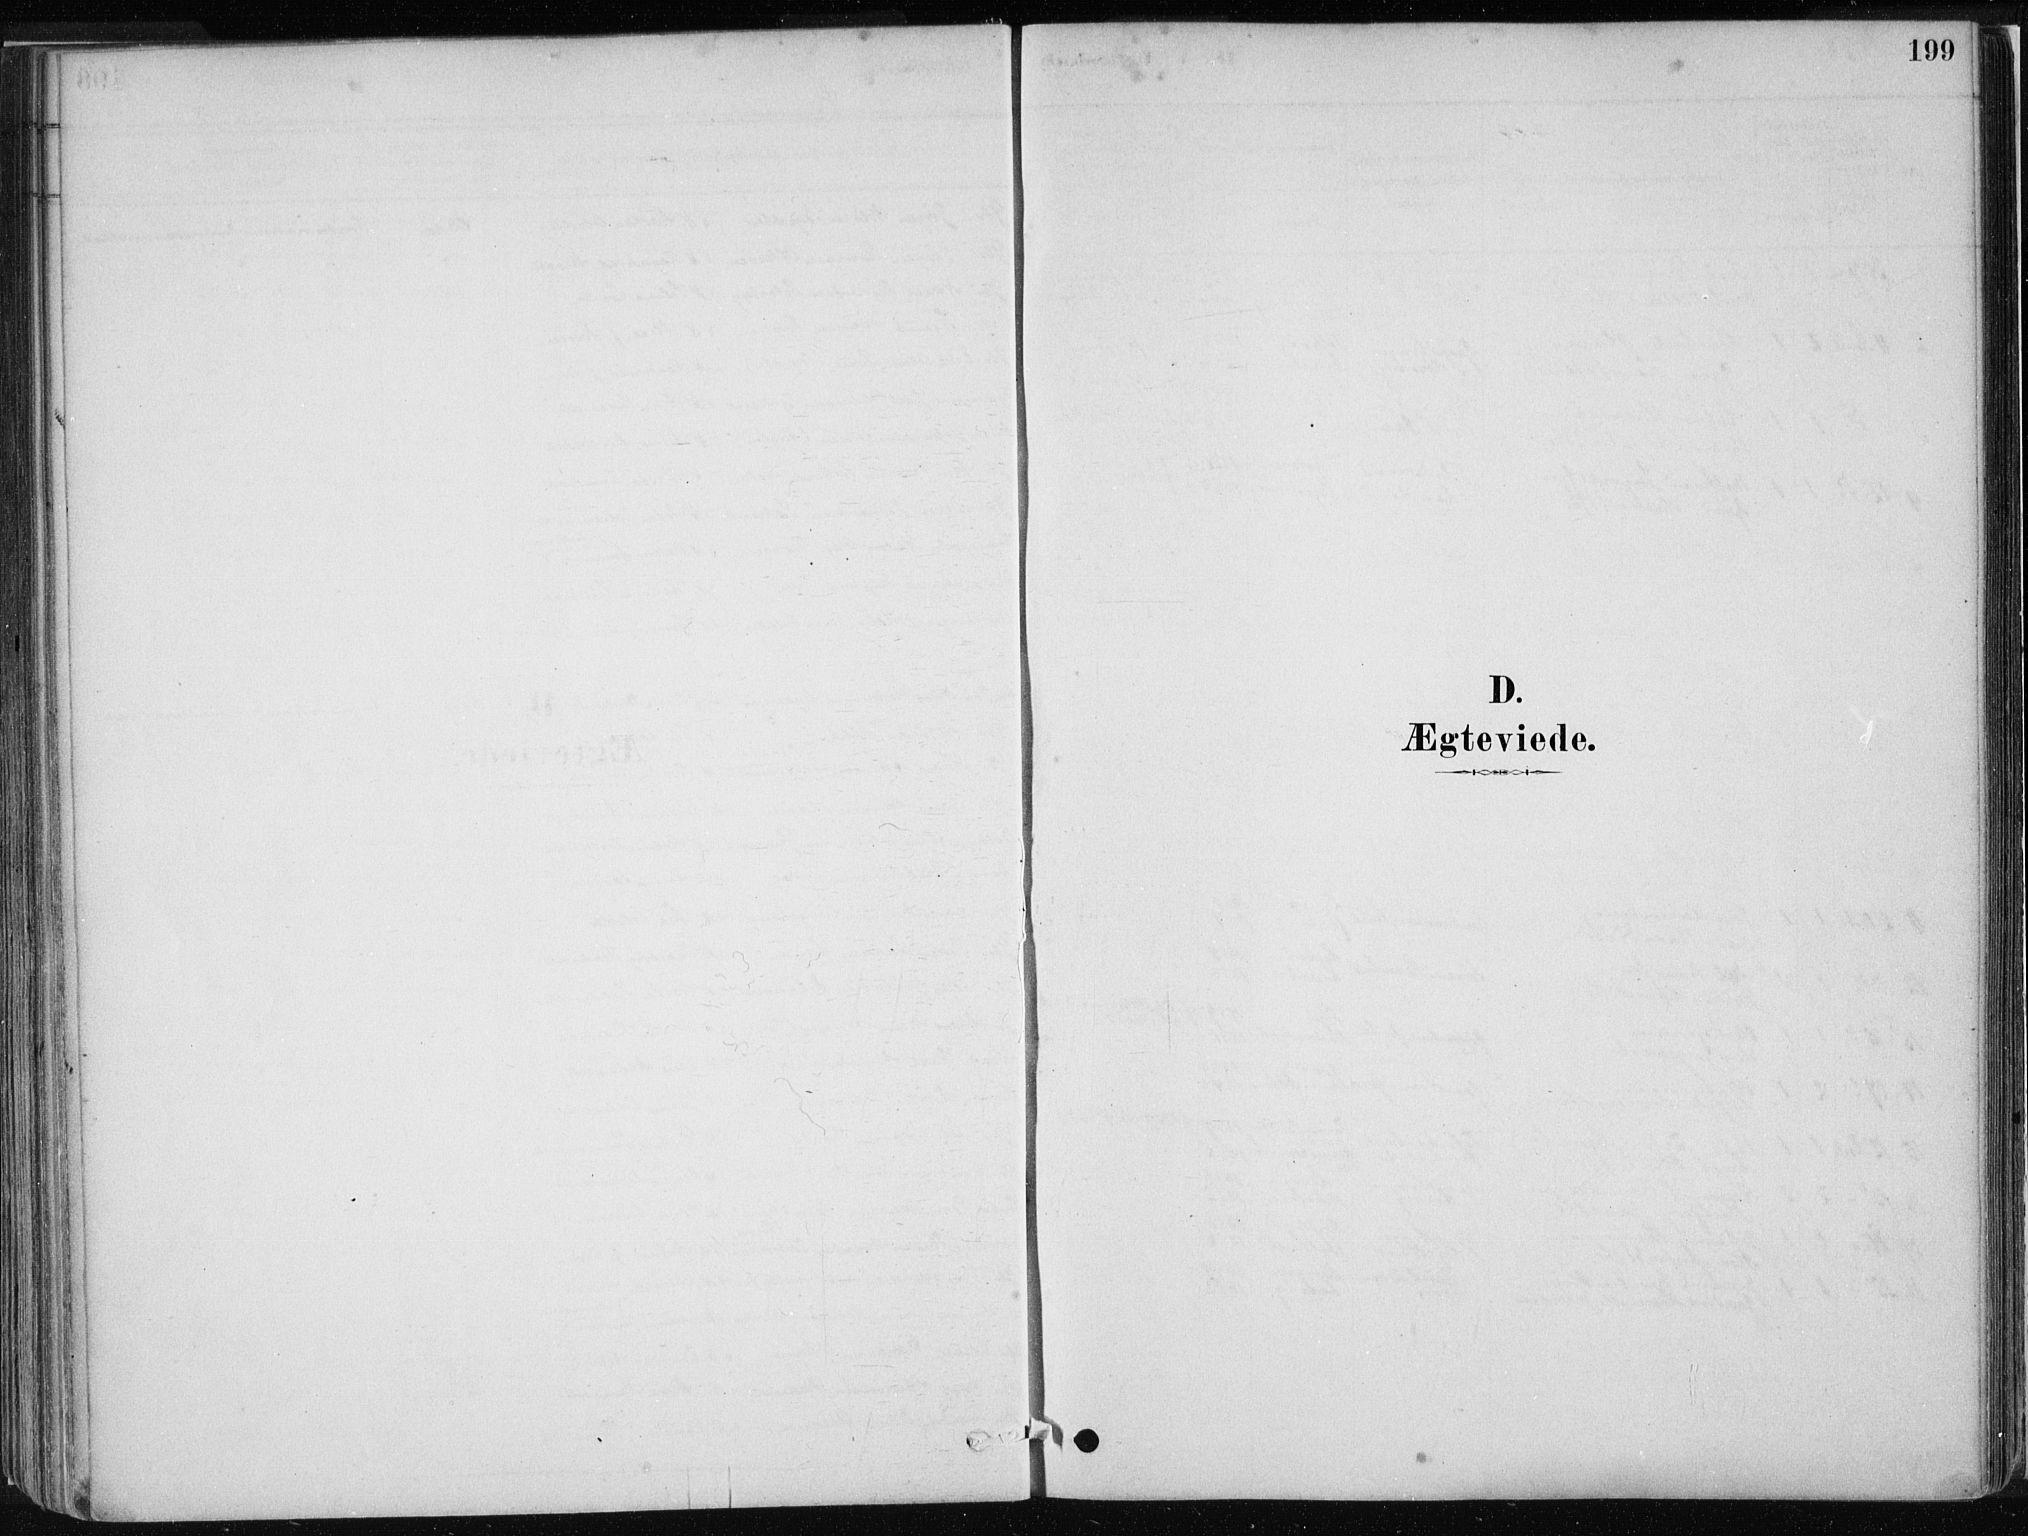 SAB, Stord sokneprestembete, H/Haa: Ministerialbok nr. B 2, 1878-1913, s. 199